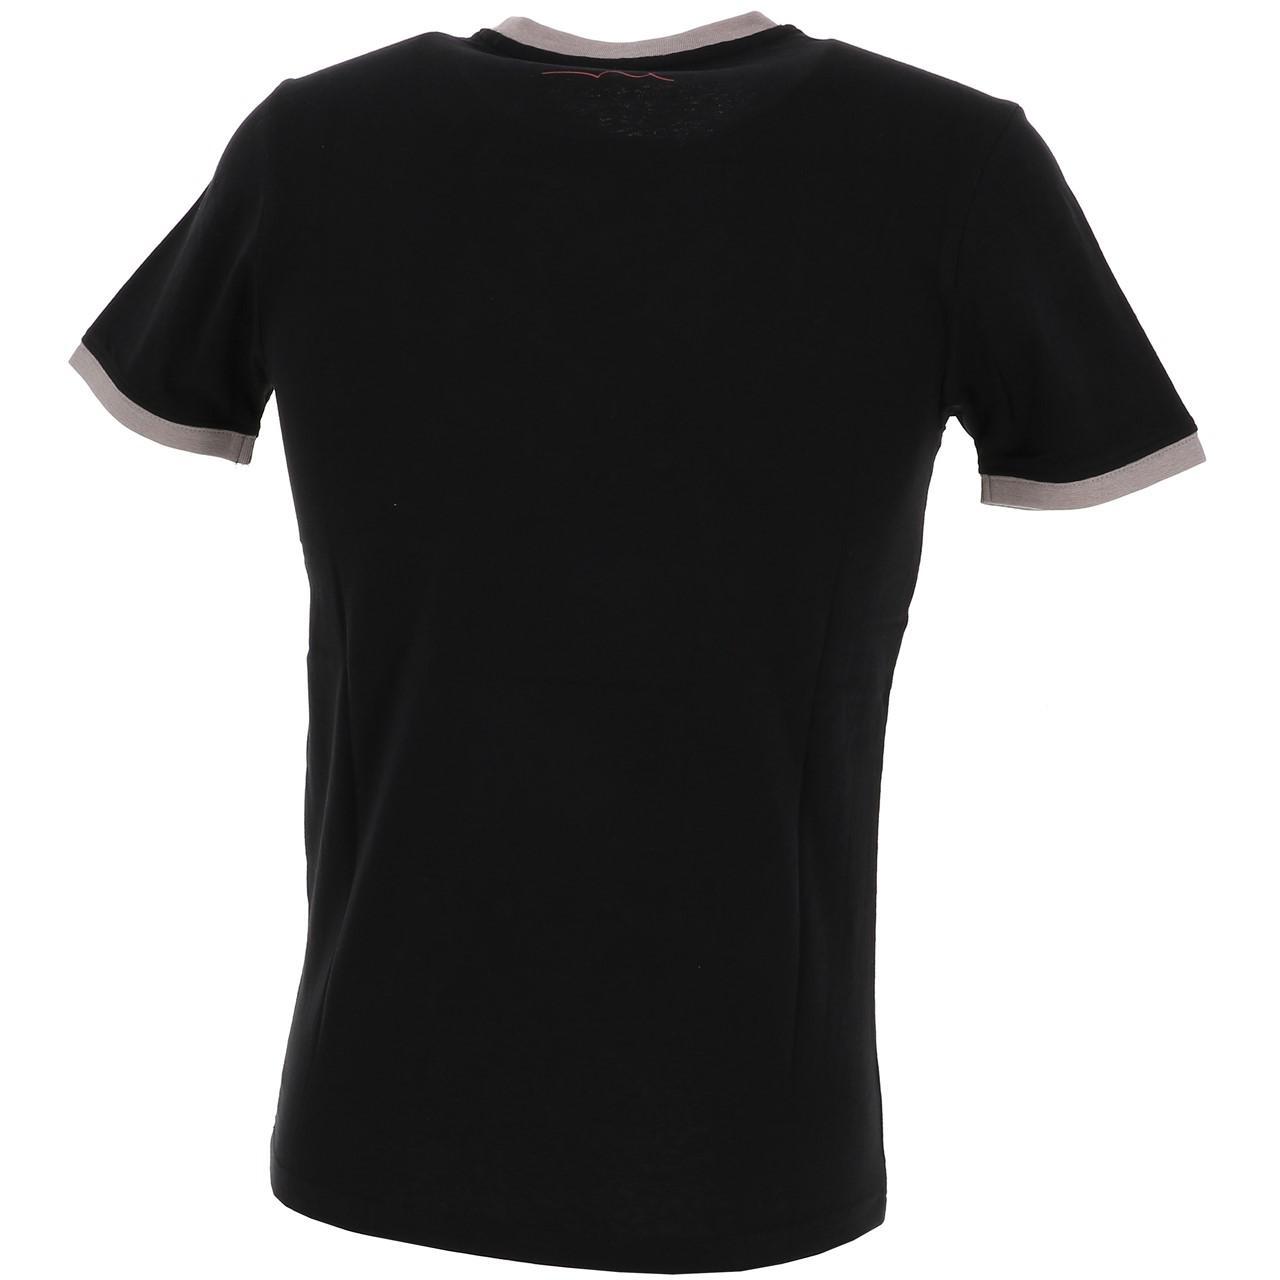 Short-Sleeve-T-Shirt-Teddy-Smith-the-Tee-Mc-Black-Black-65767-New thumbnail 5